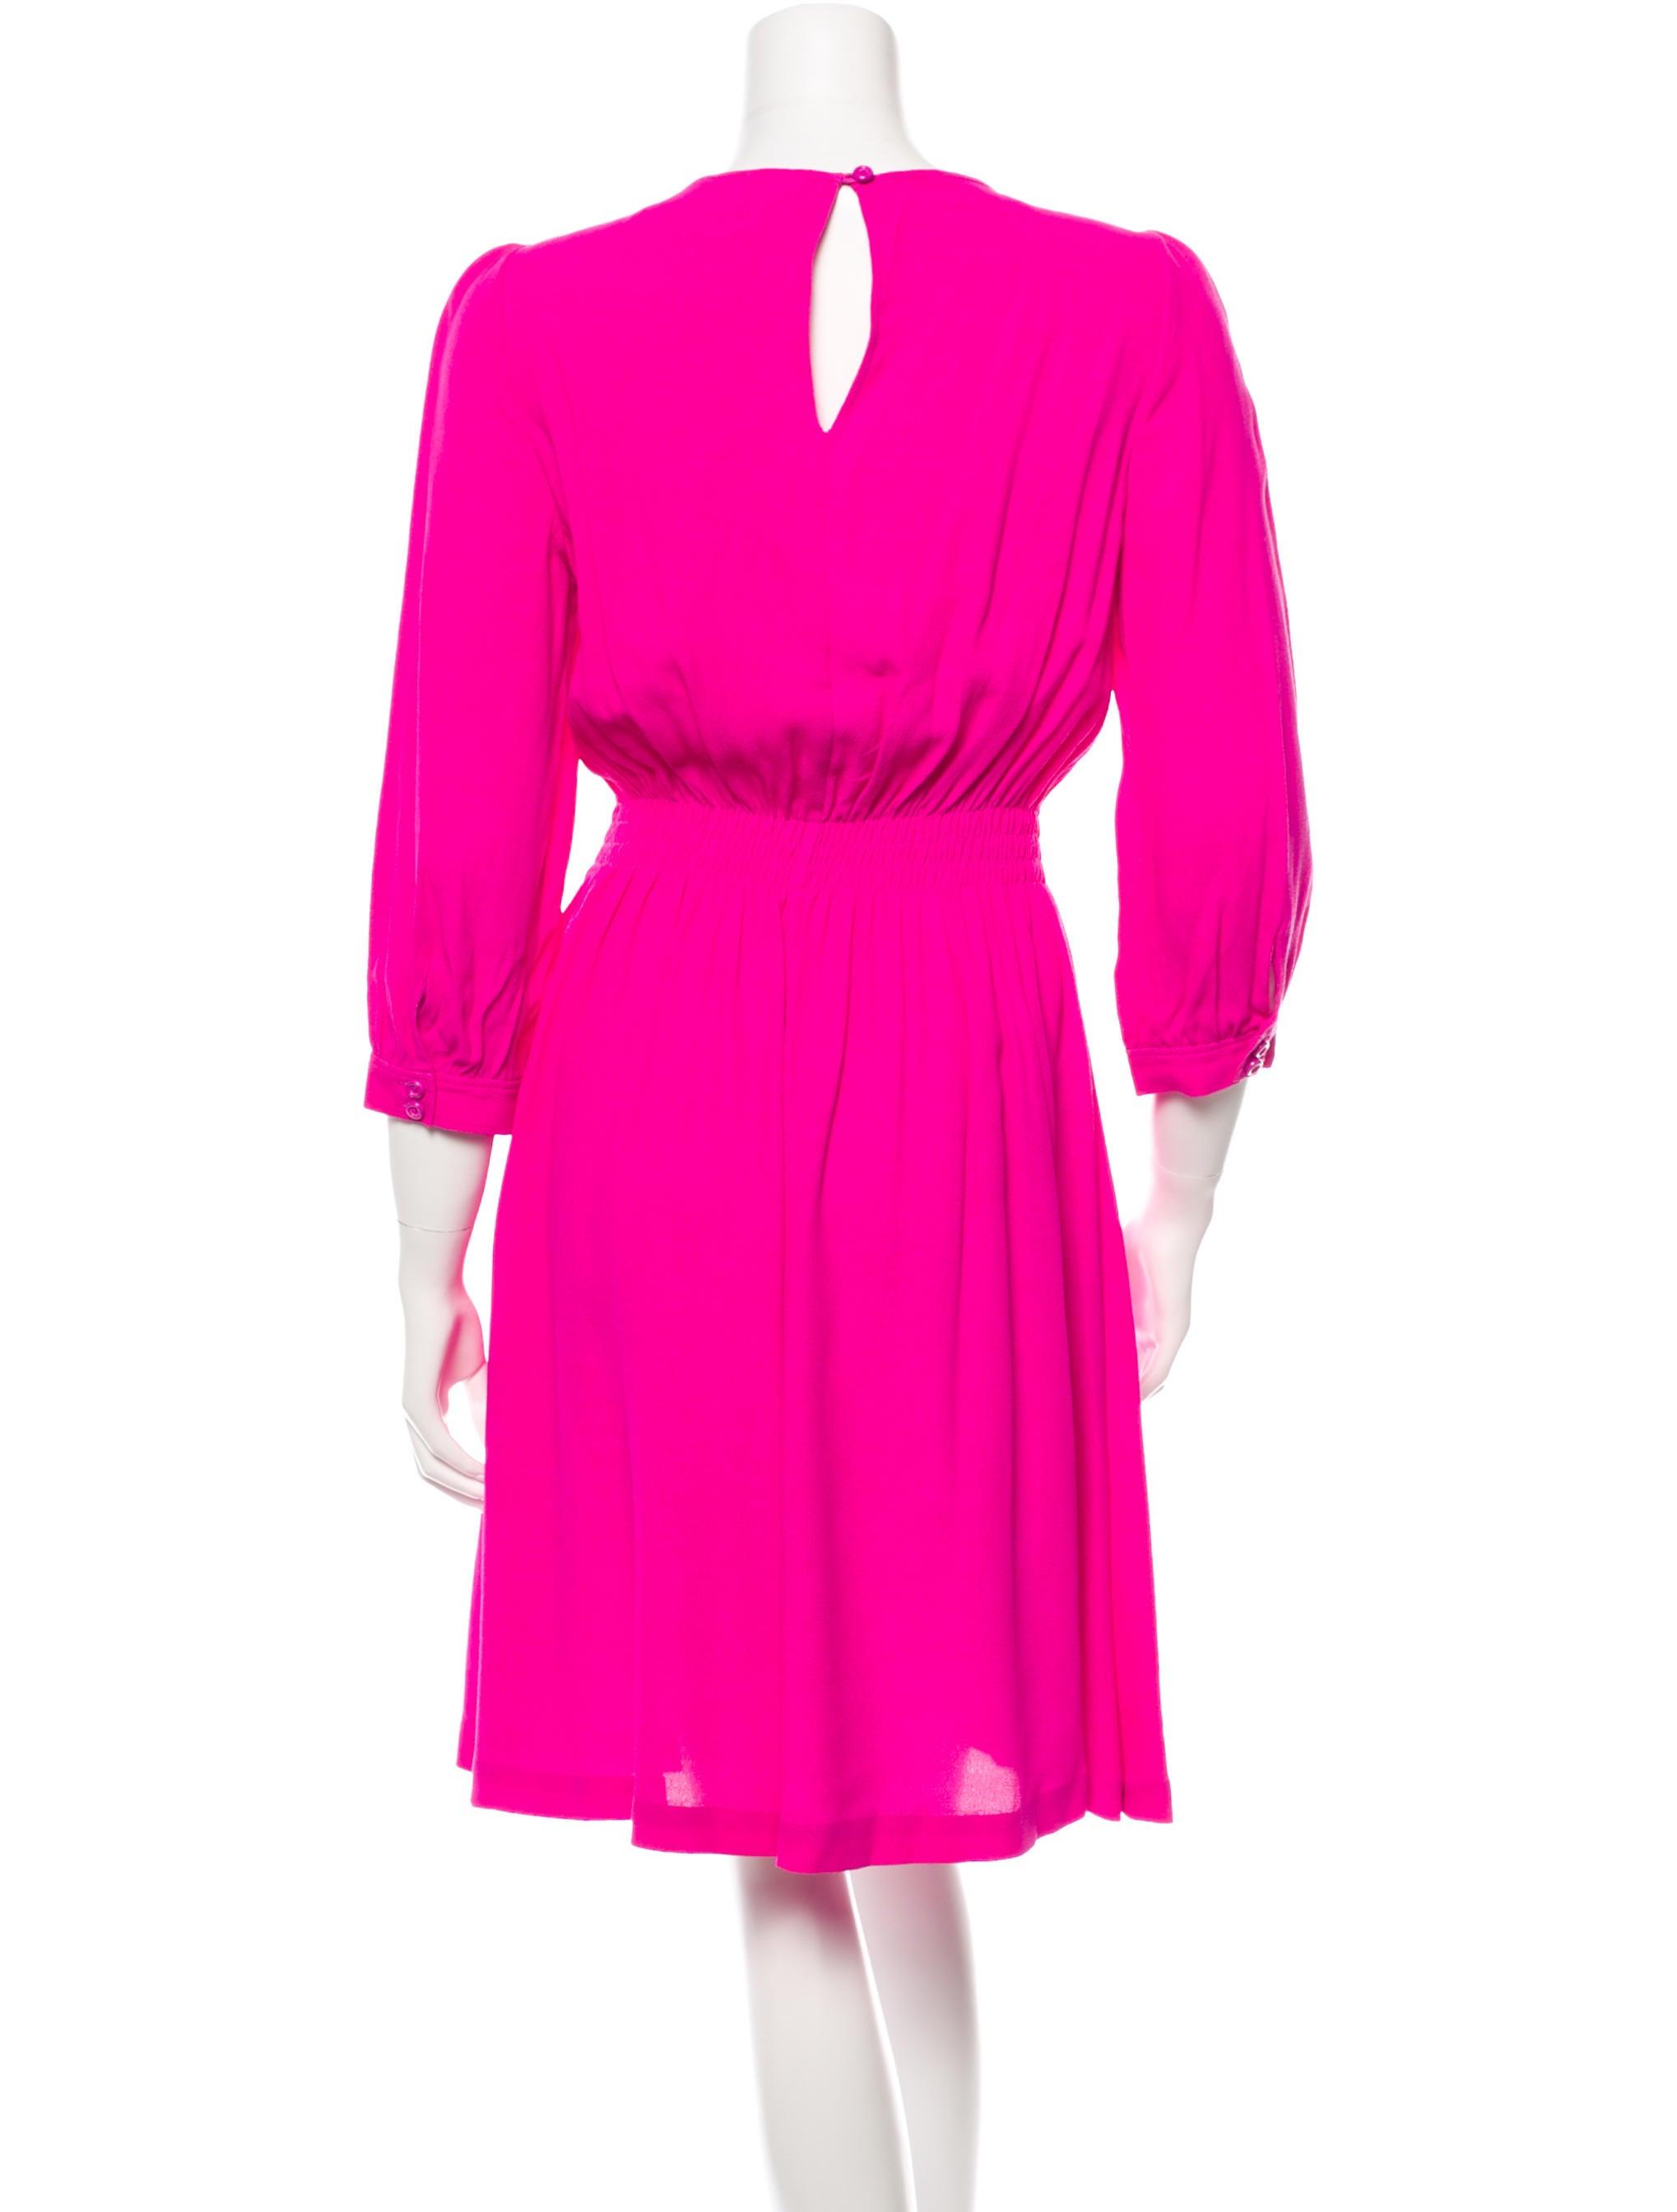 Kate Spade New York Pleated Long Sleeve Dress Clothing